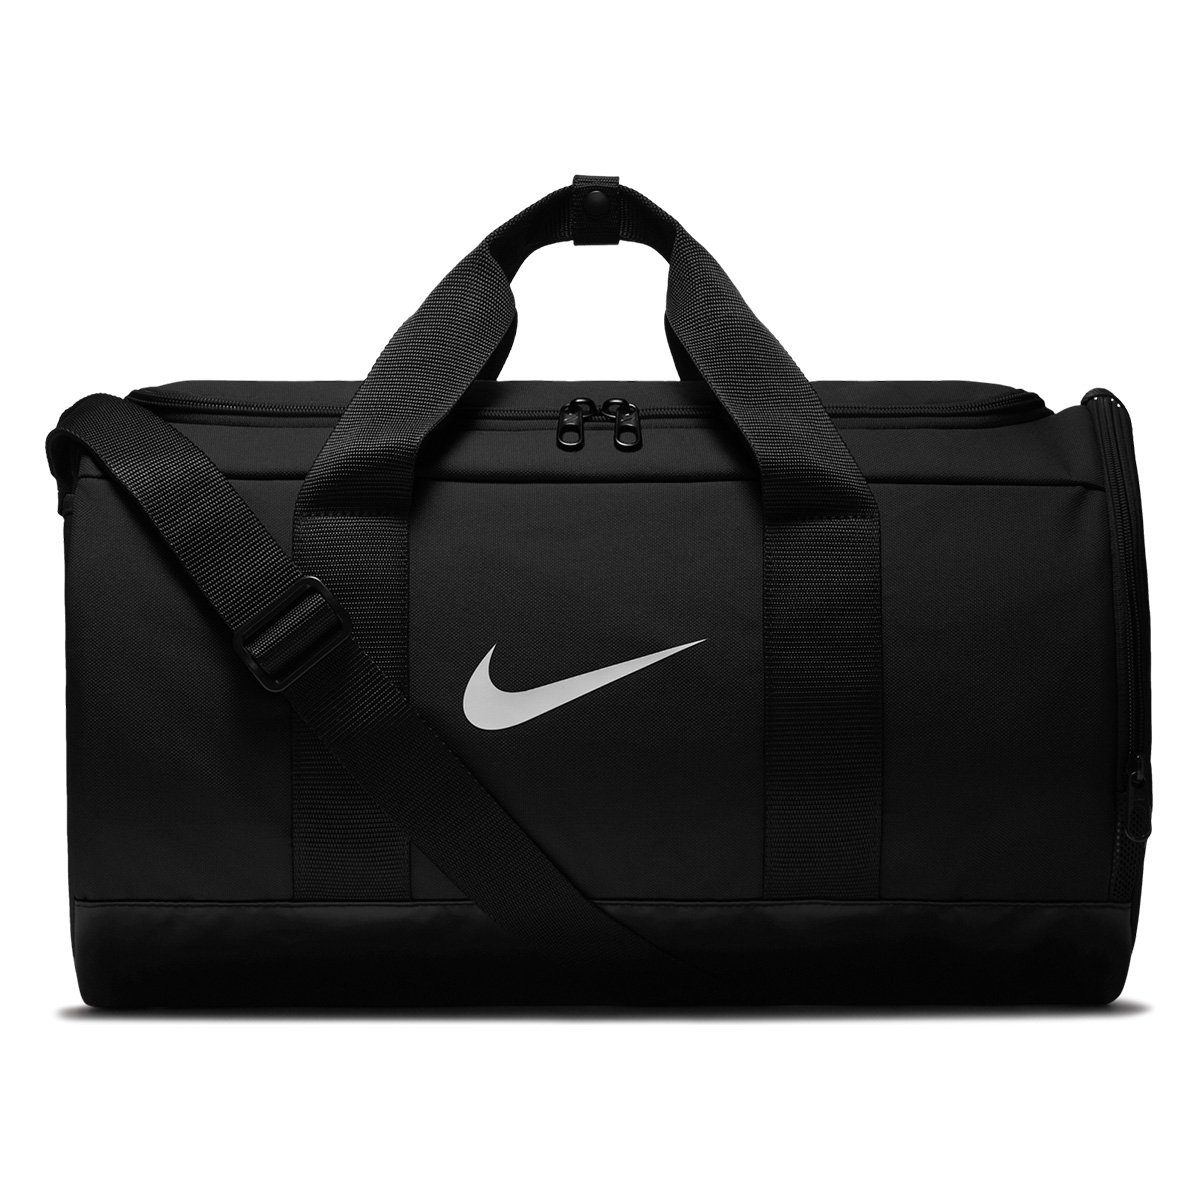 Mala Nike Team Duff - 27 Litros - 1